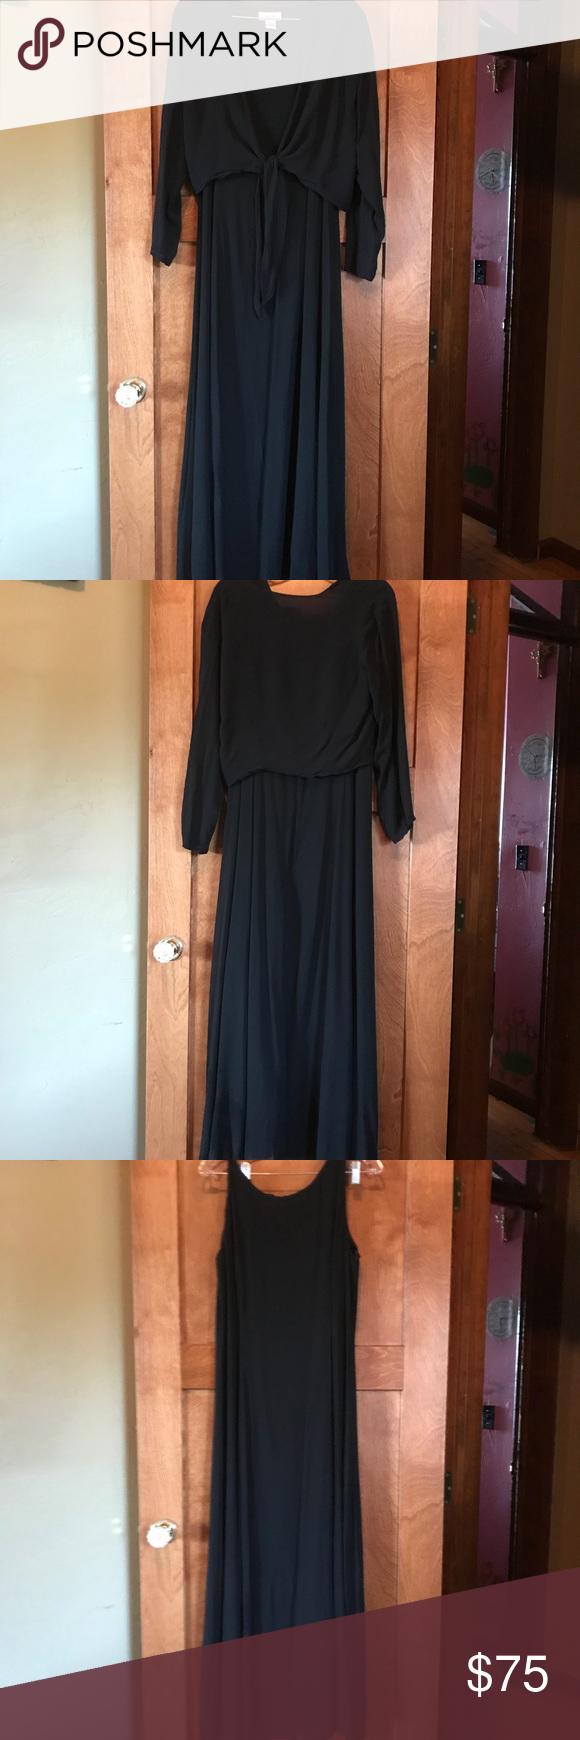 Dorman Silk Black Dress With Jacket Black Silk Dress Jacket Dress Black Dress [ 1740 x 580 Pixel ]